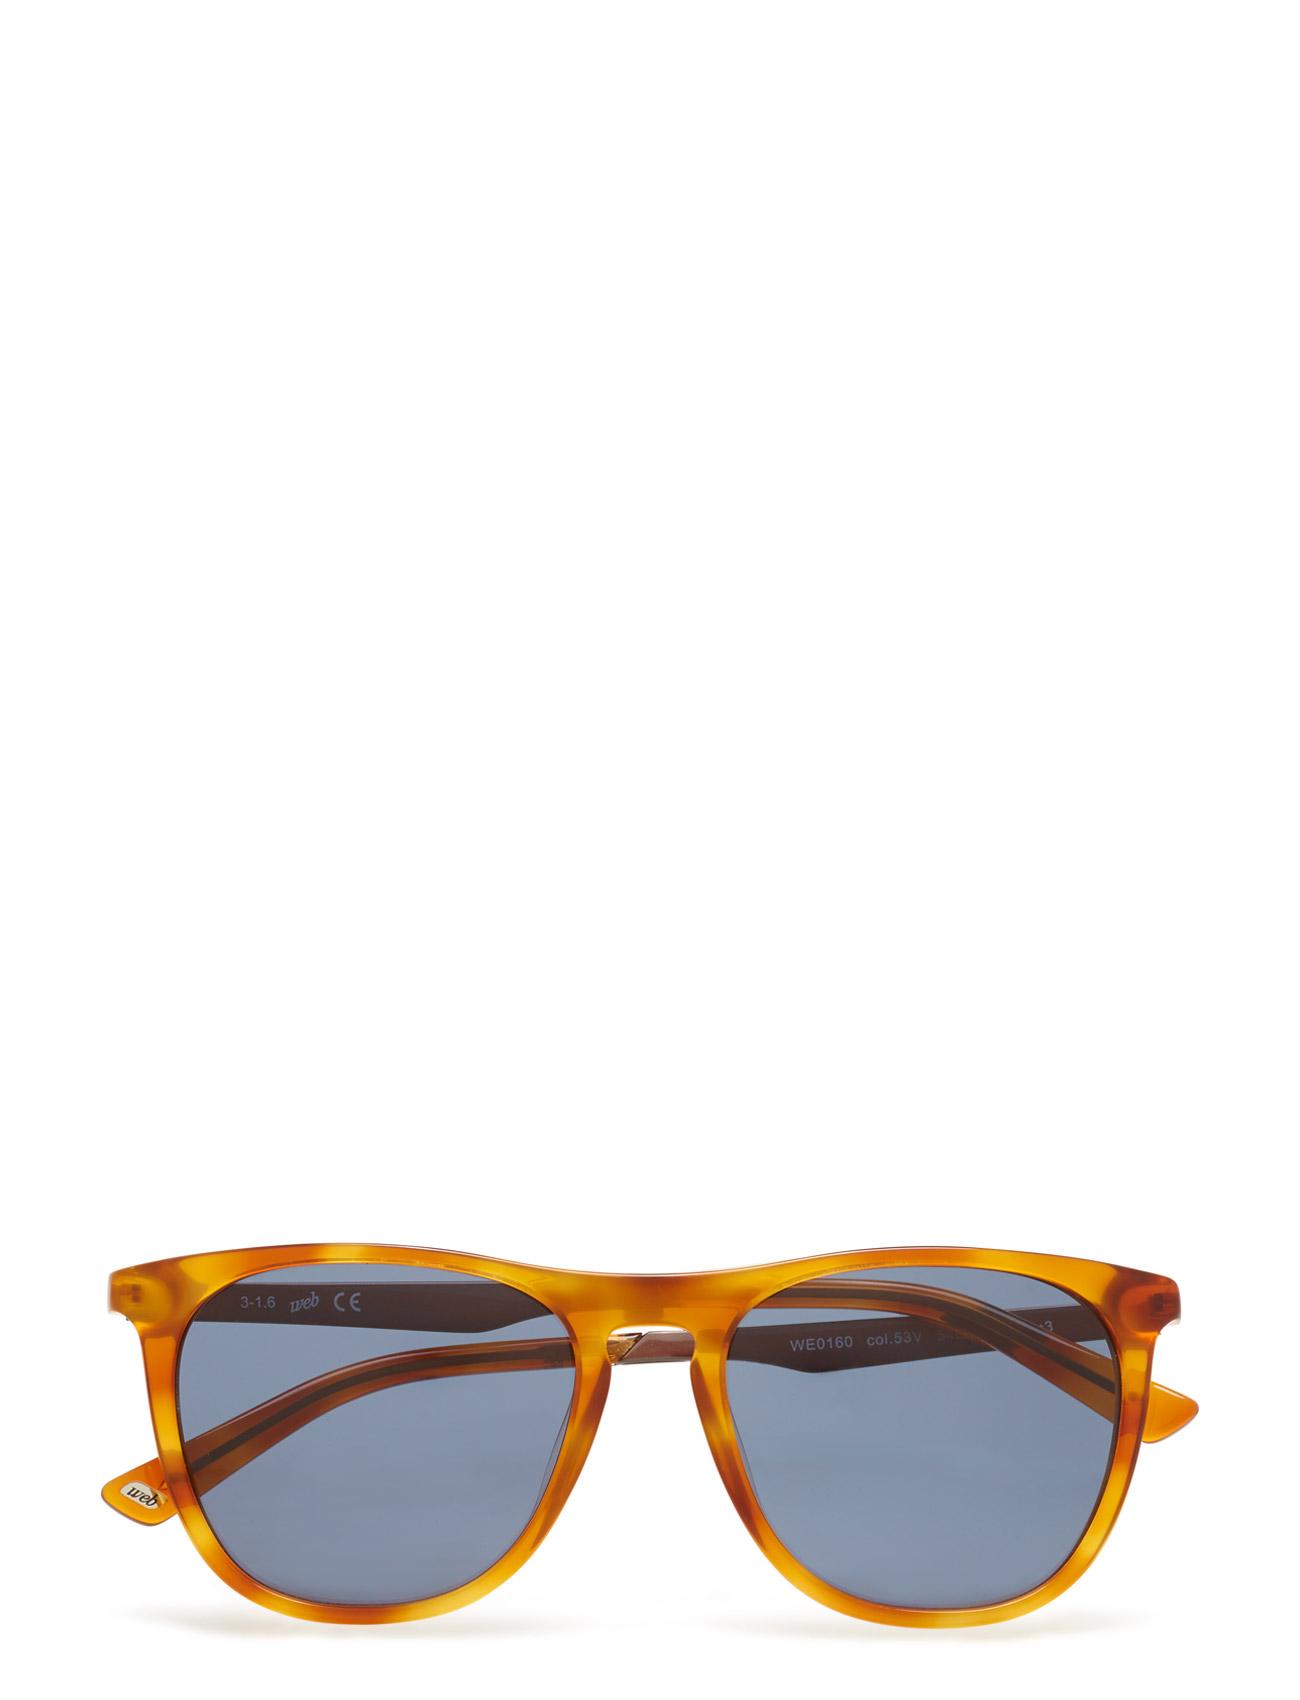 web eyewear We0160 på boozt.com dk